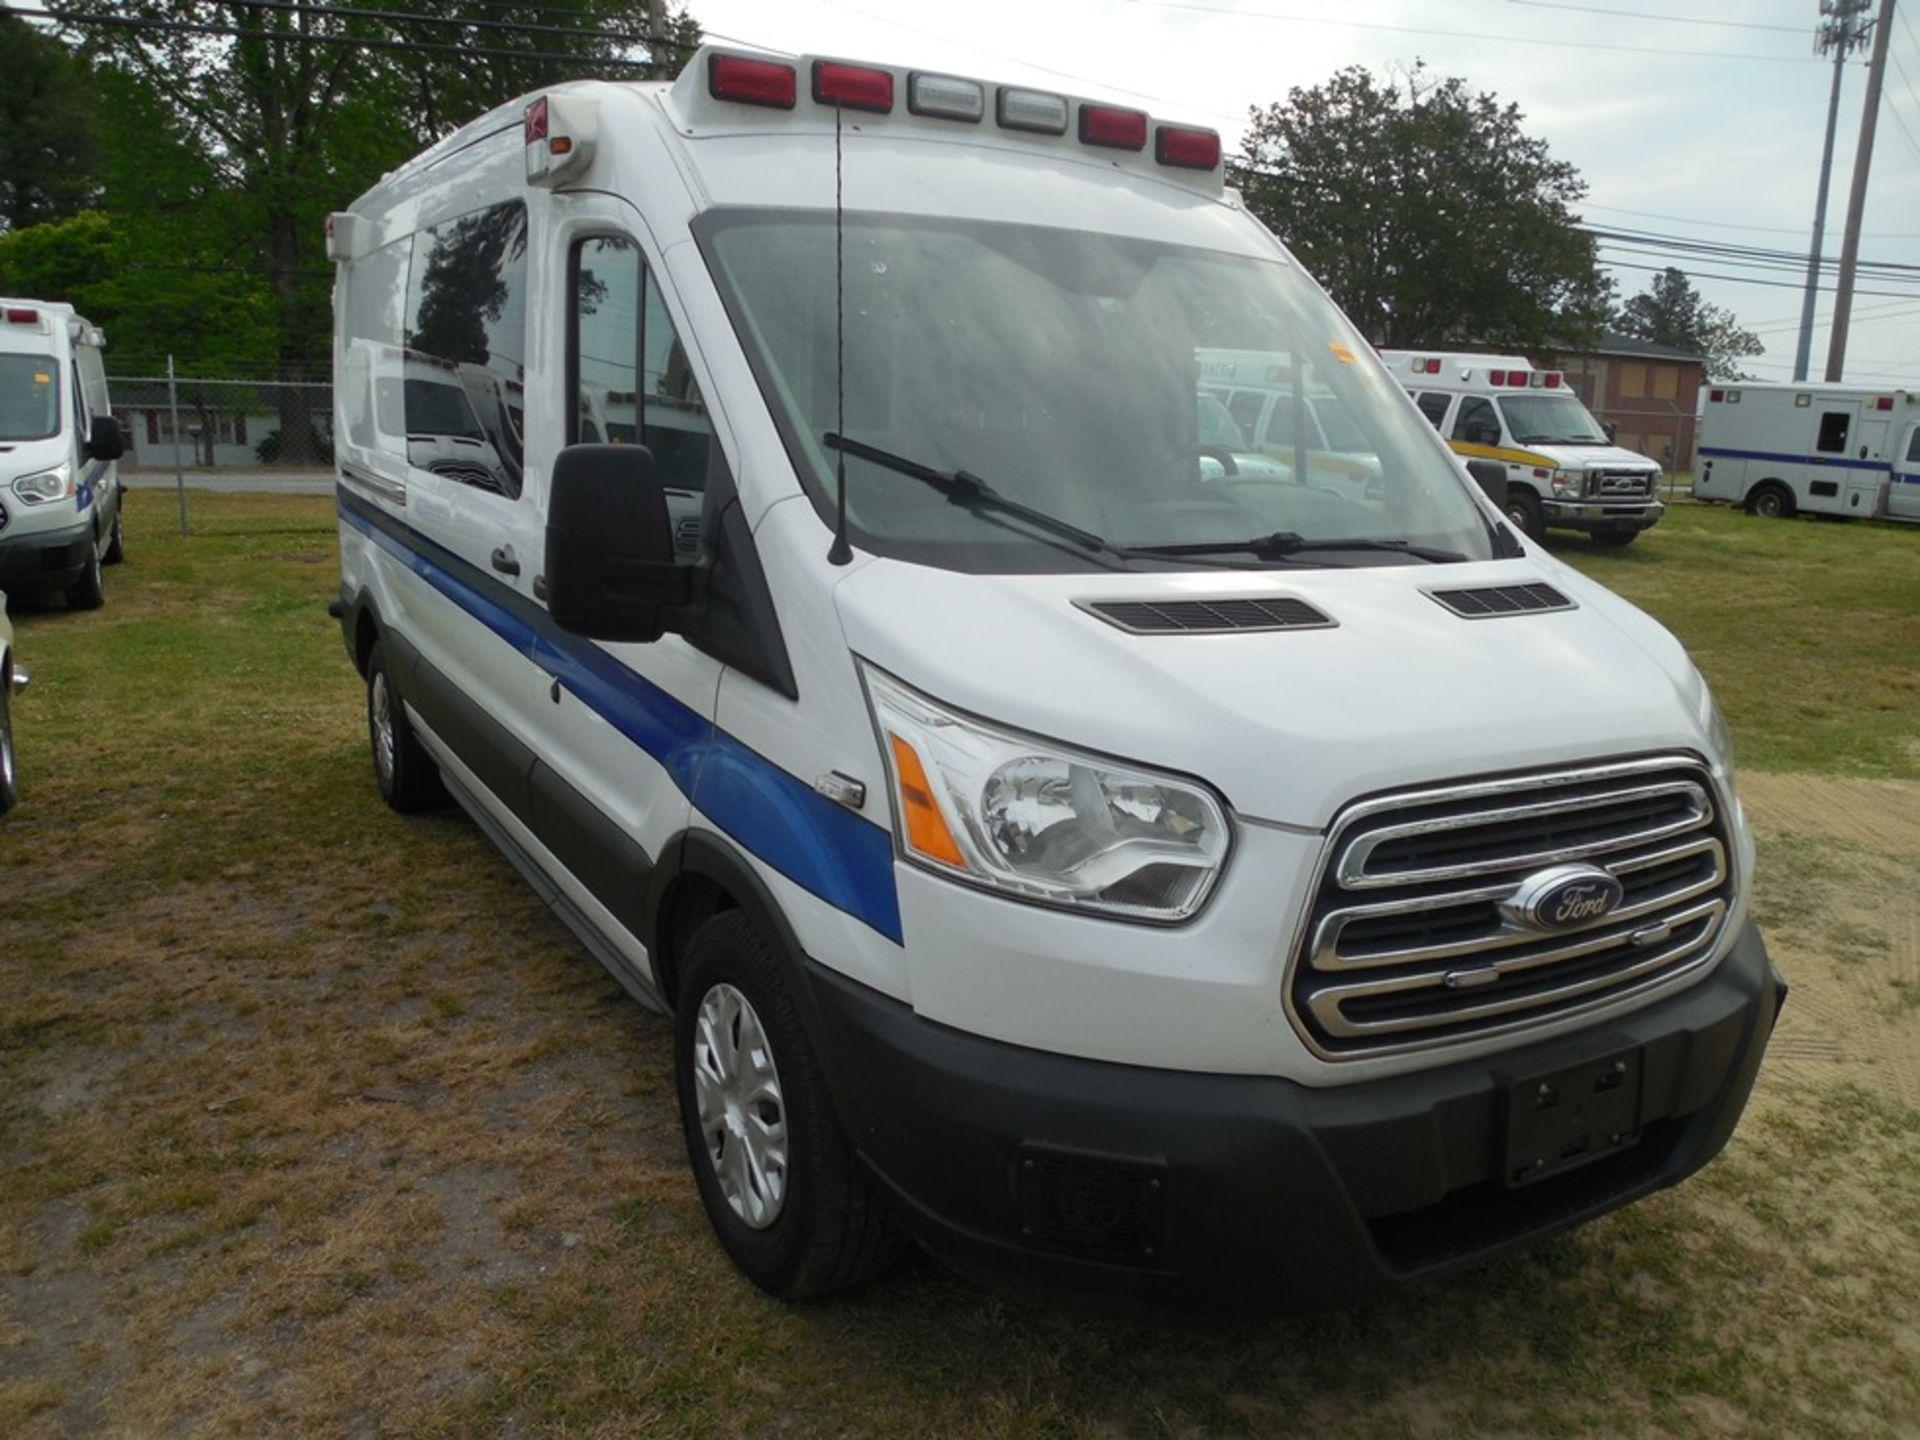 2015 Ford Tansit 250 dsl ambulance 194,312 miles vin# 1FDYR2CV5FKB33096 - Image 3 of 6